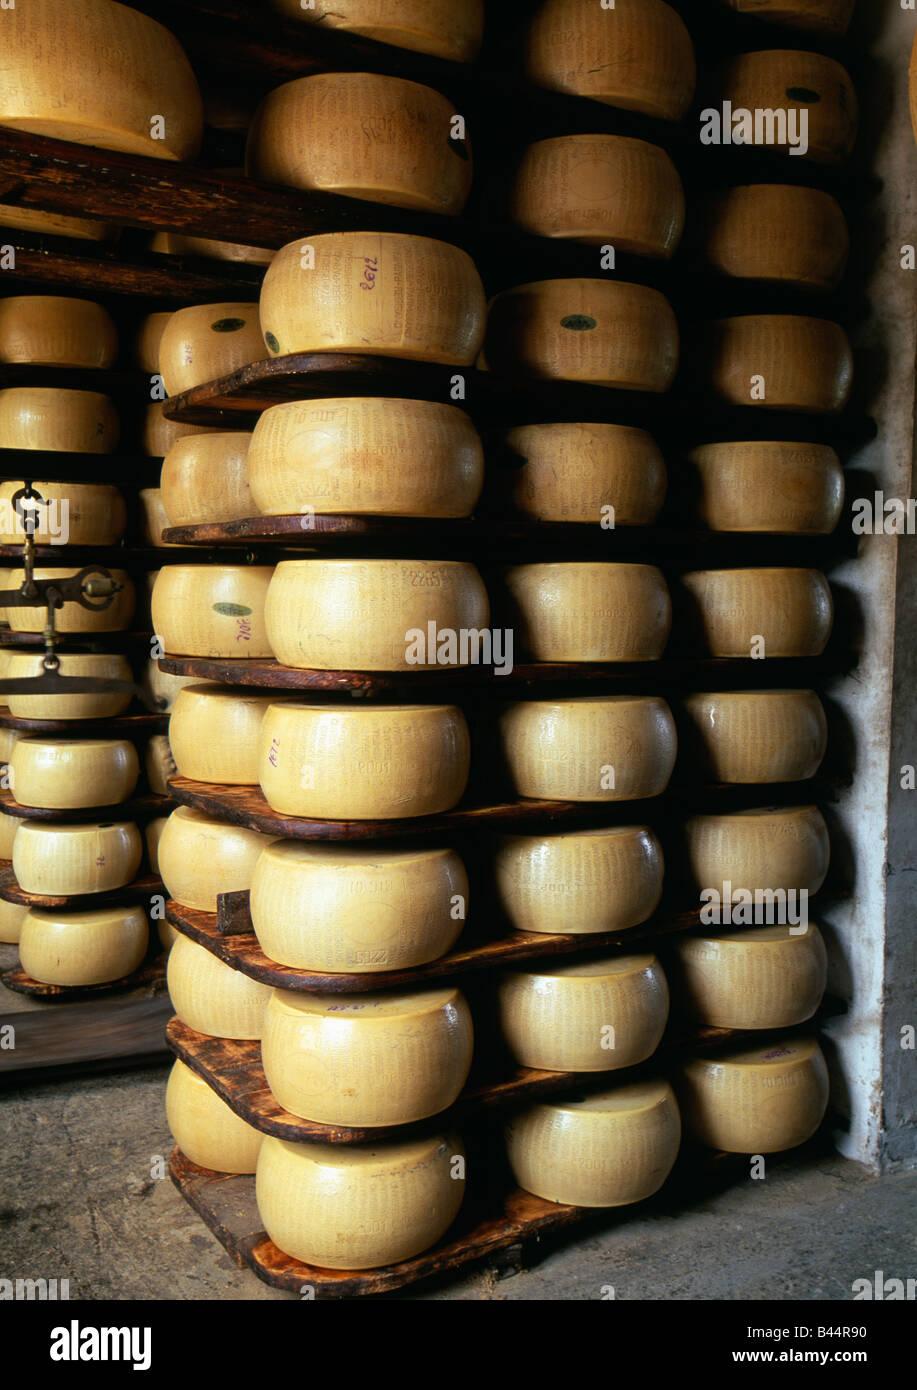 Bodega de queso parmesano Imagen De Stock